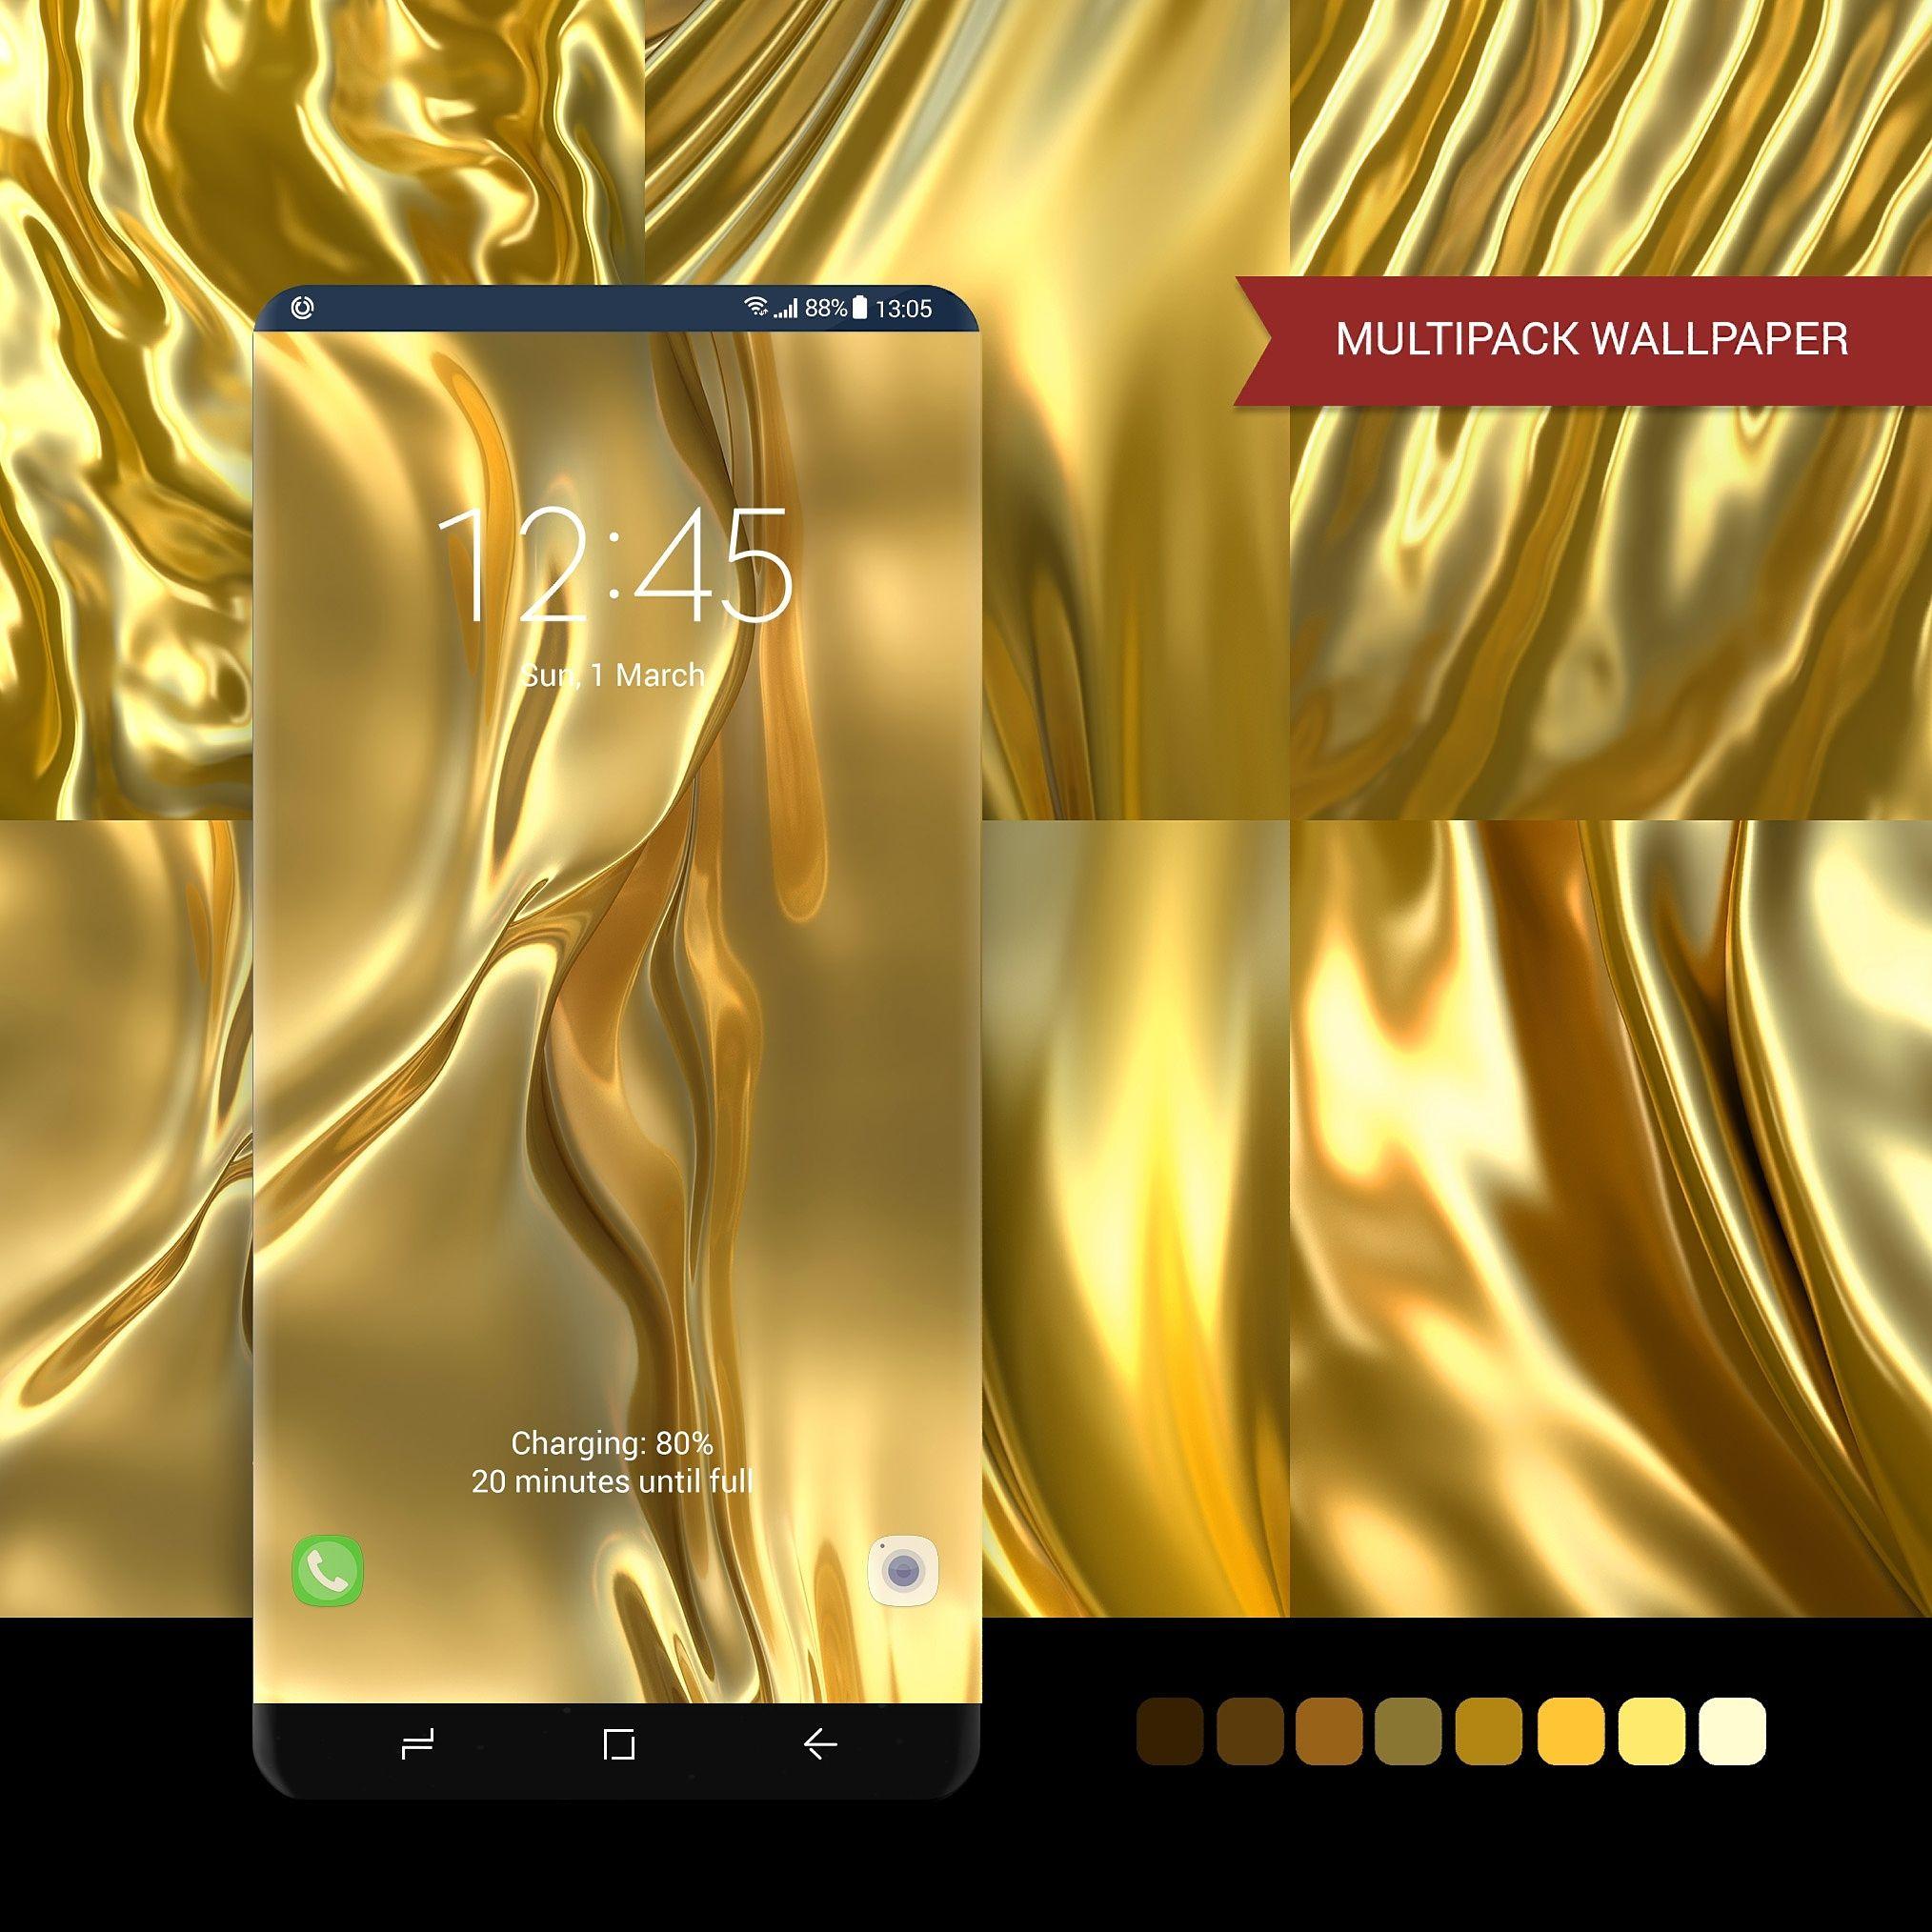 Honey Gold Wallpaper Multipack In 2021 Samsung Galaxy Wallpaper Samsung Wallpaper Gold Wallpaper